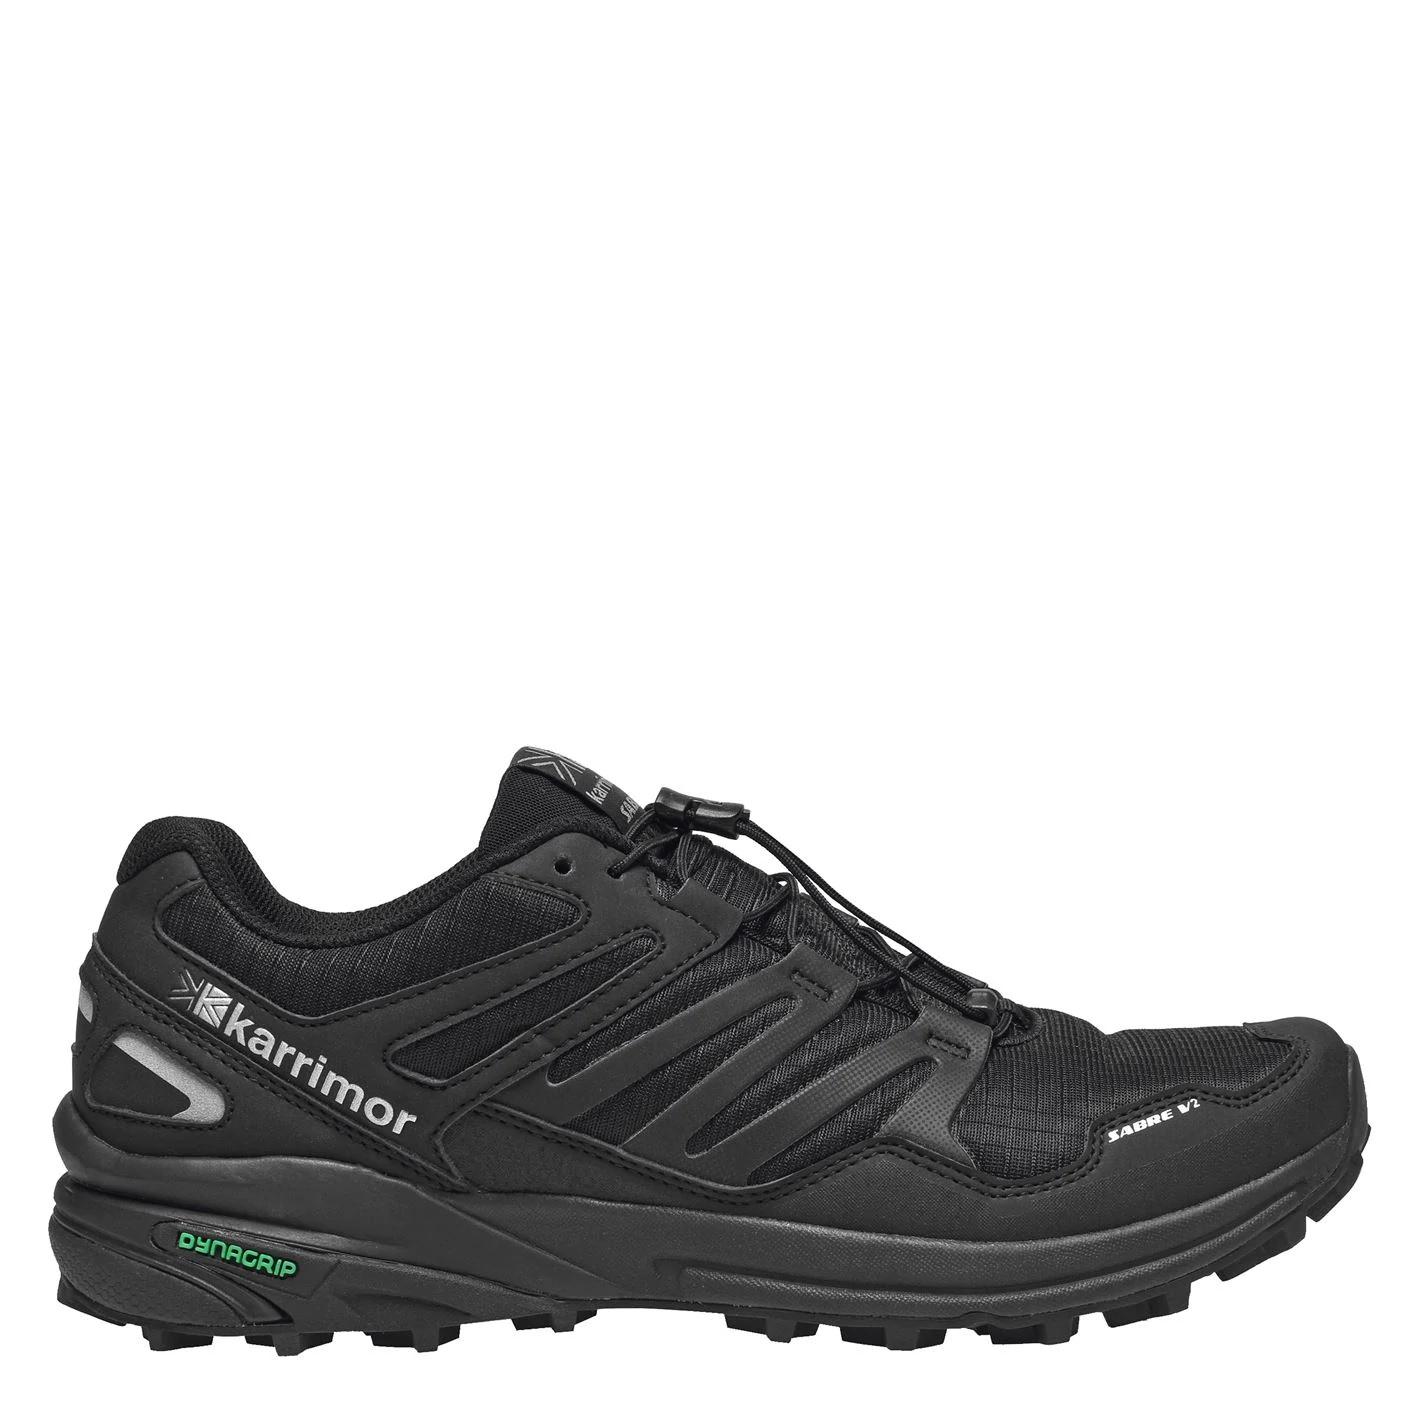 Pánske bežecké topánky Karrimor Sabre Trail